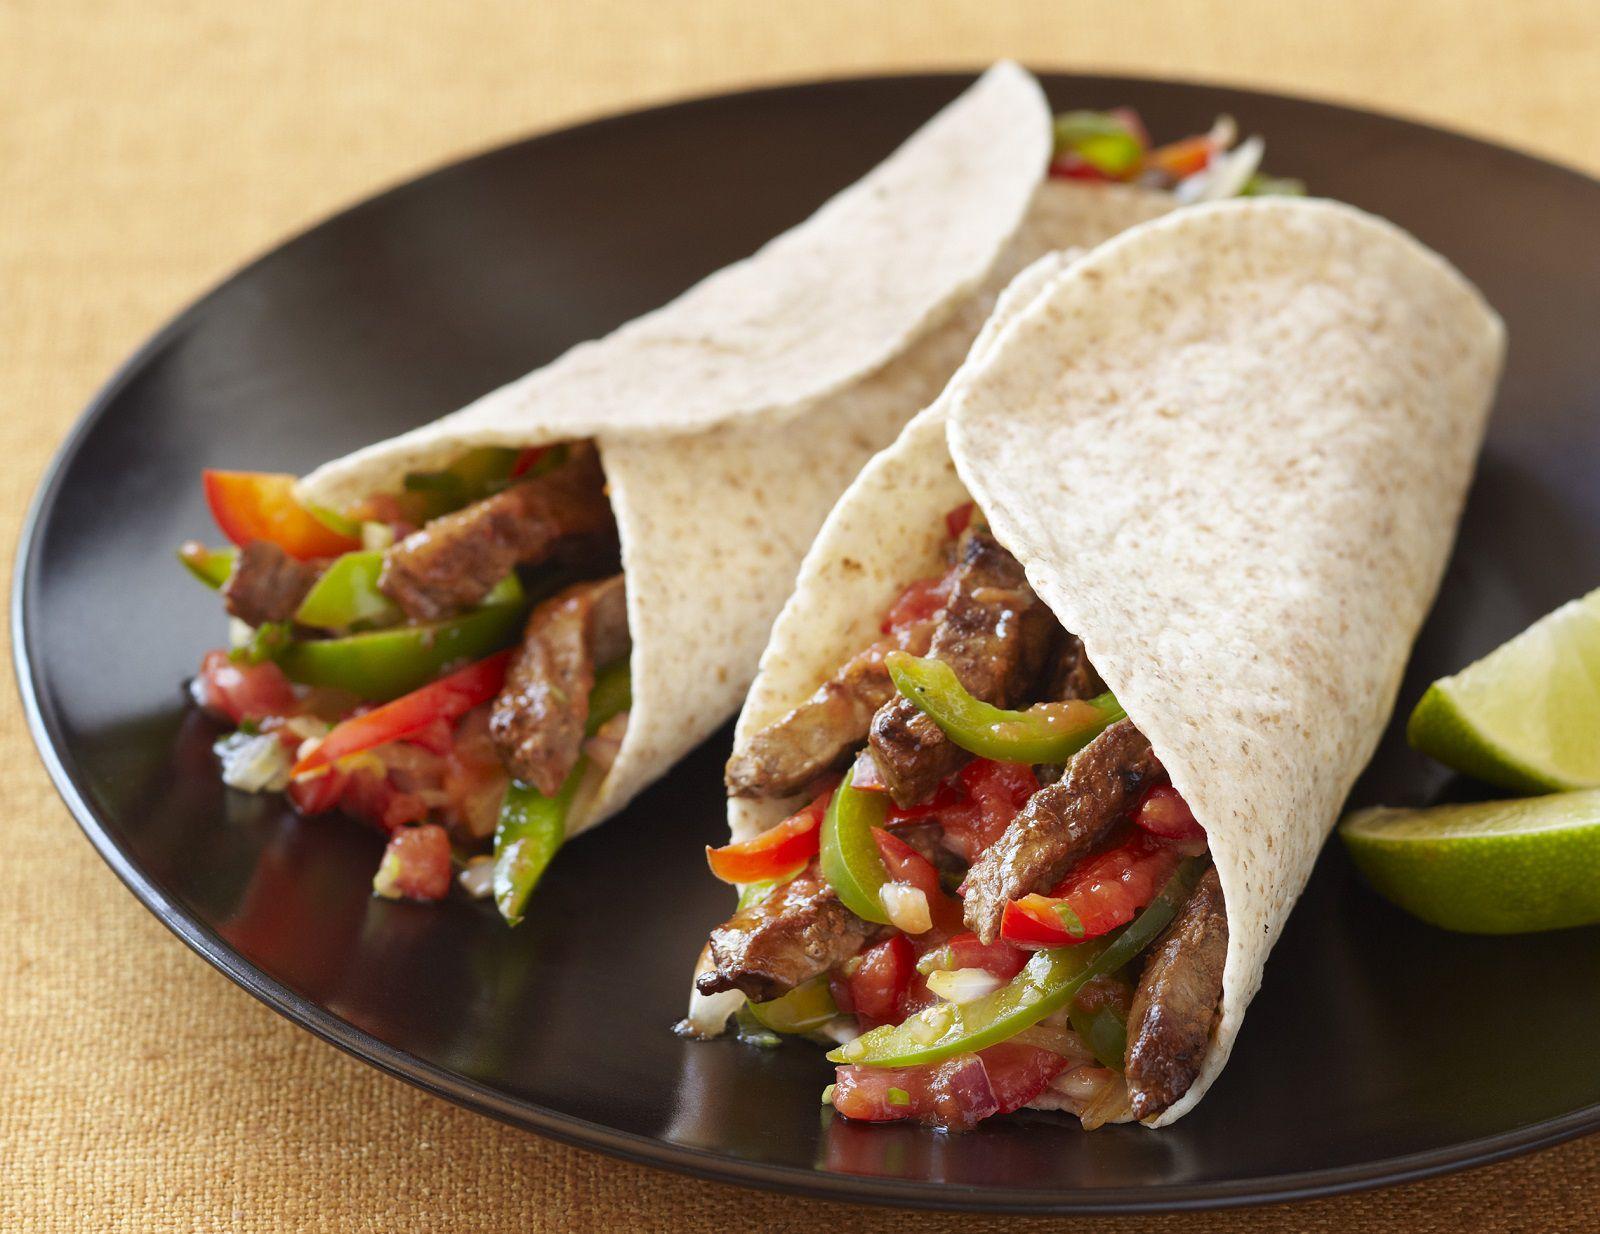 Healthy Chicken or Beef Fajita Recipe